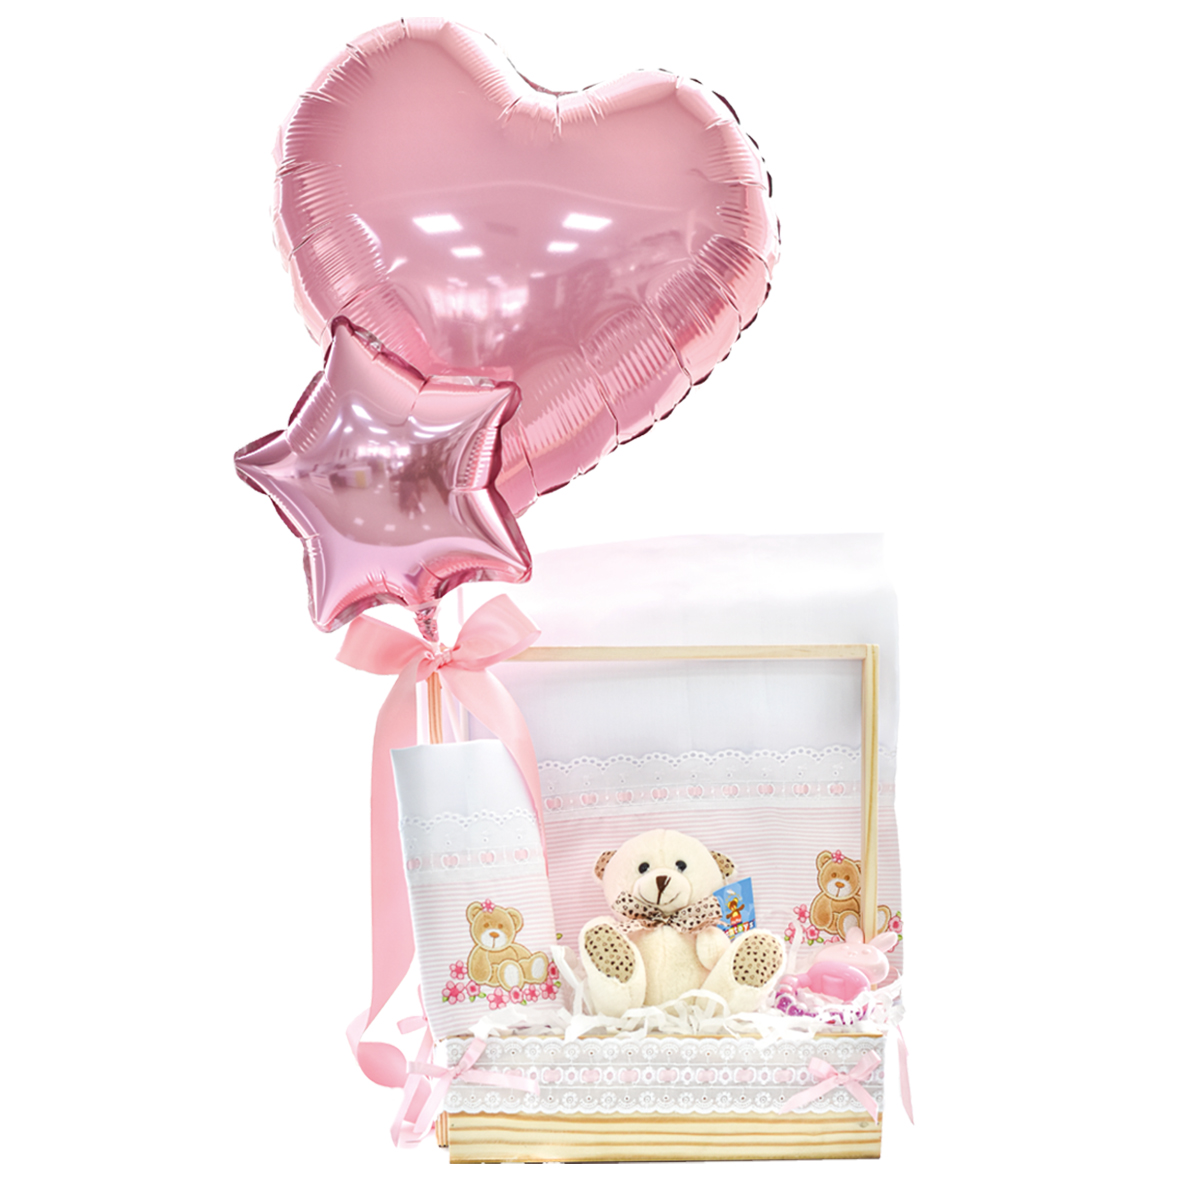 regalo para bebe con peluche de osito rosa